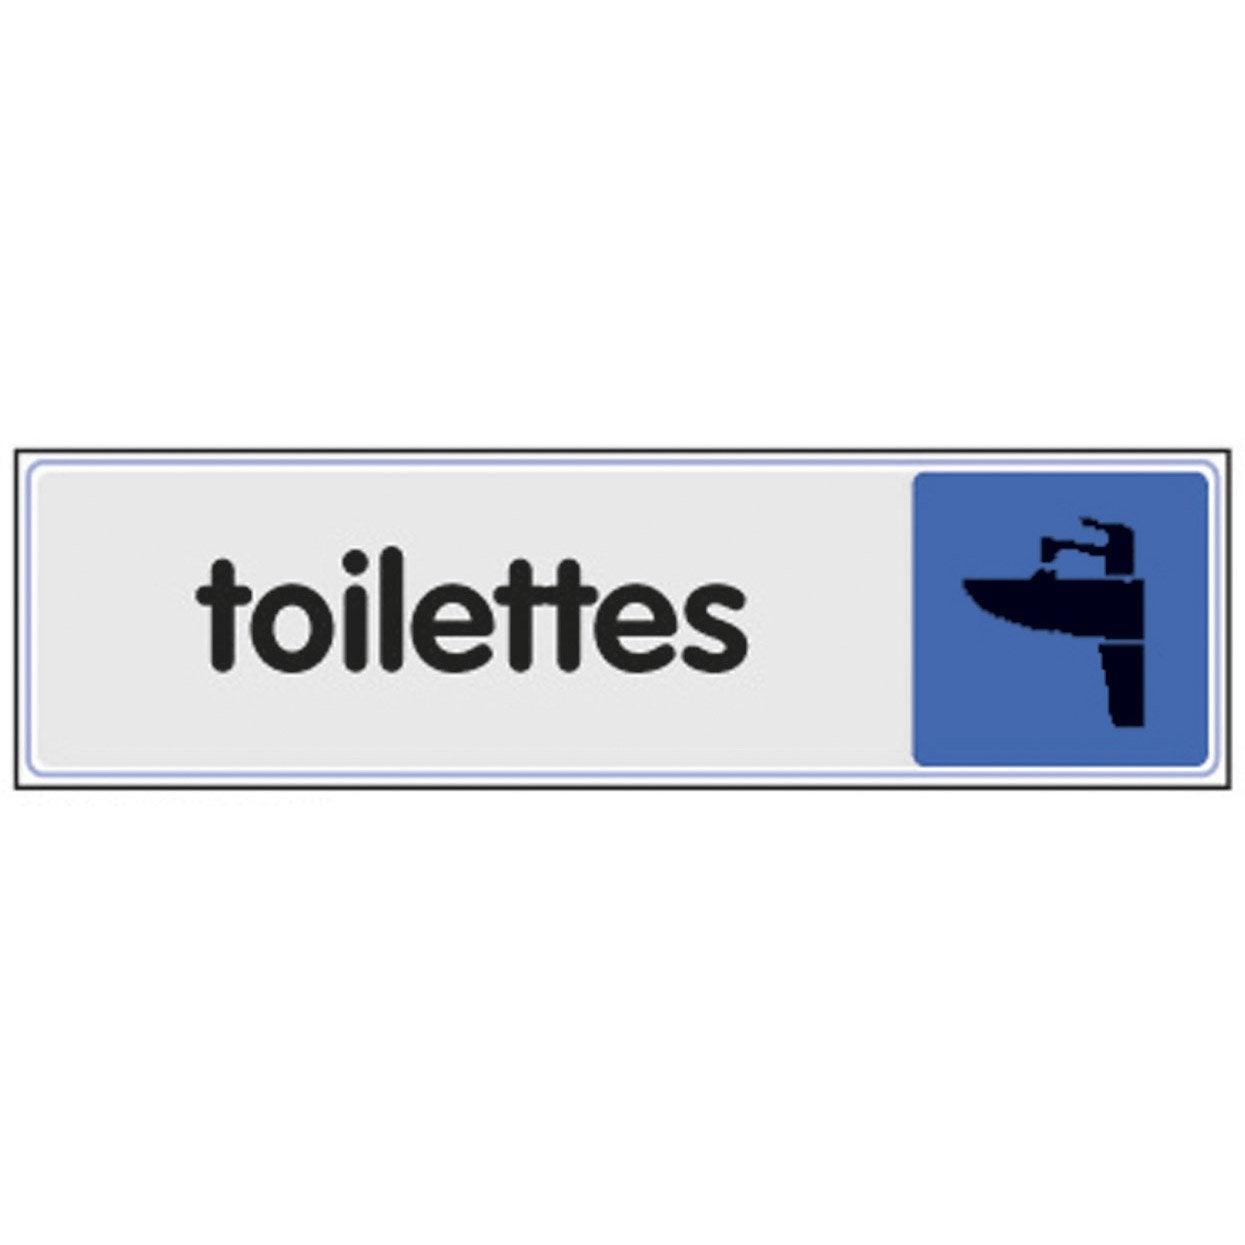 Plaque toilettes en plexiglass leroy merlin - Plaque en plexiglas ...